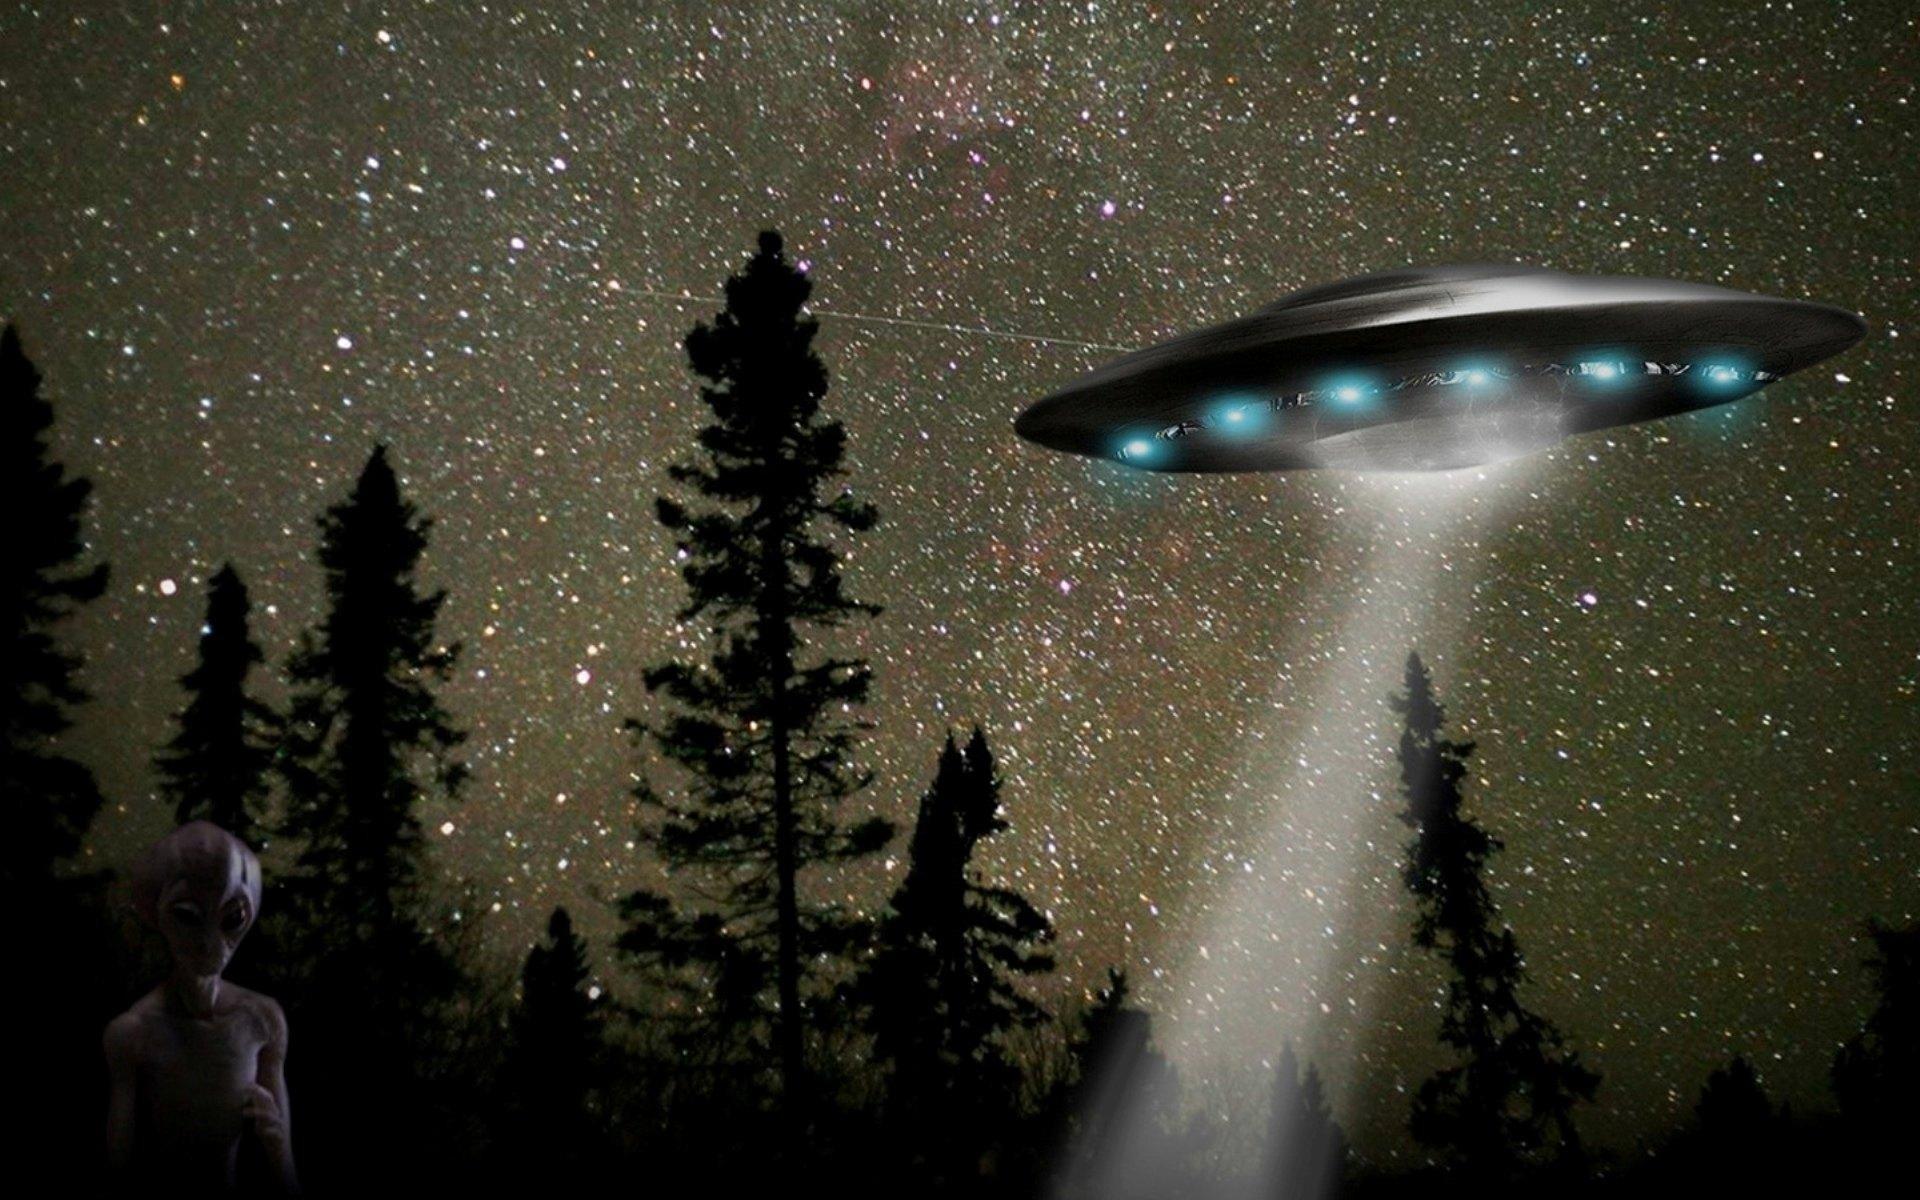 Alien Spaceship Wallpaper (74+ Images